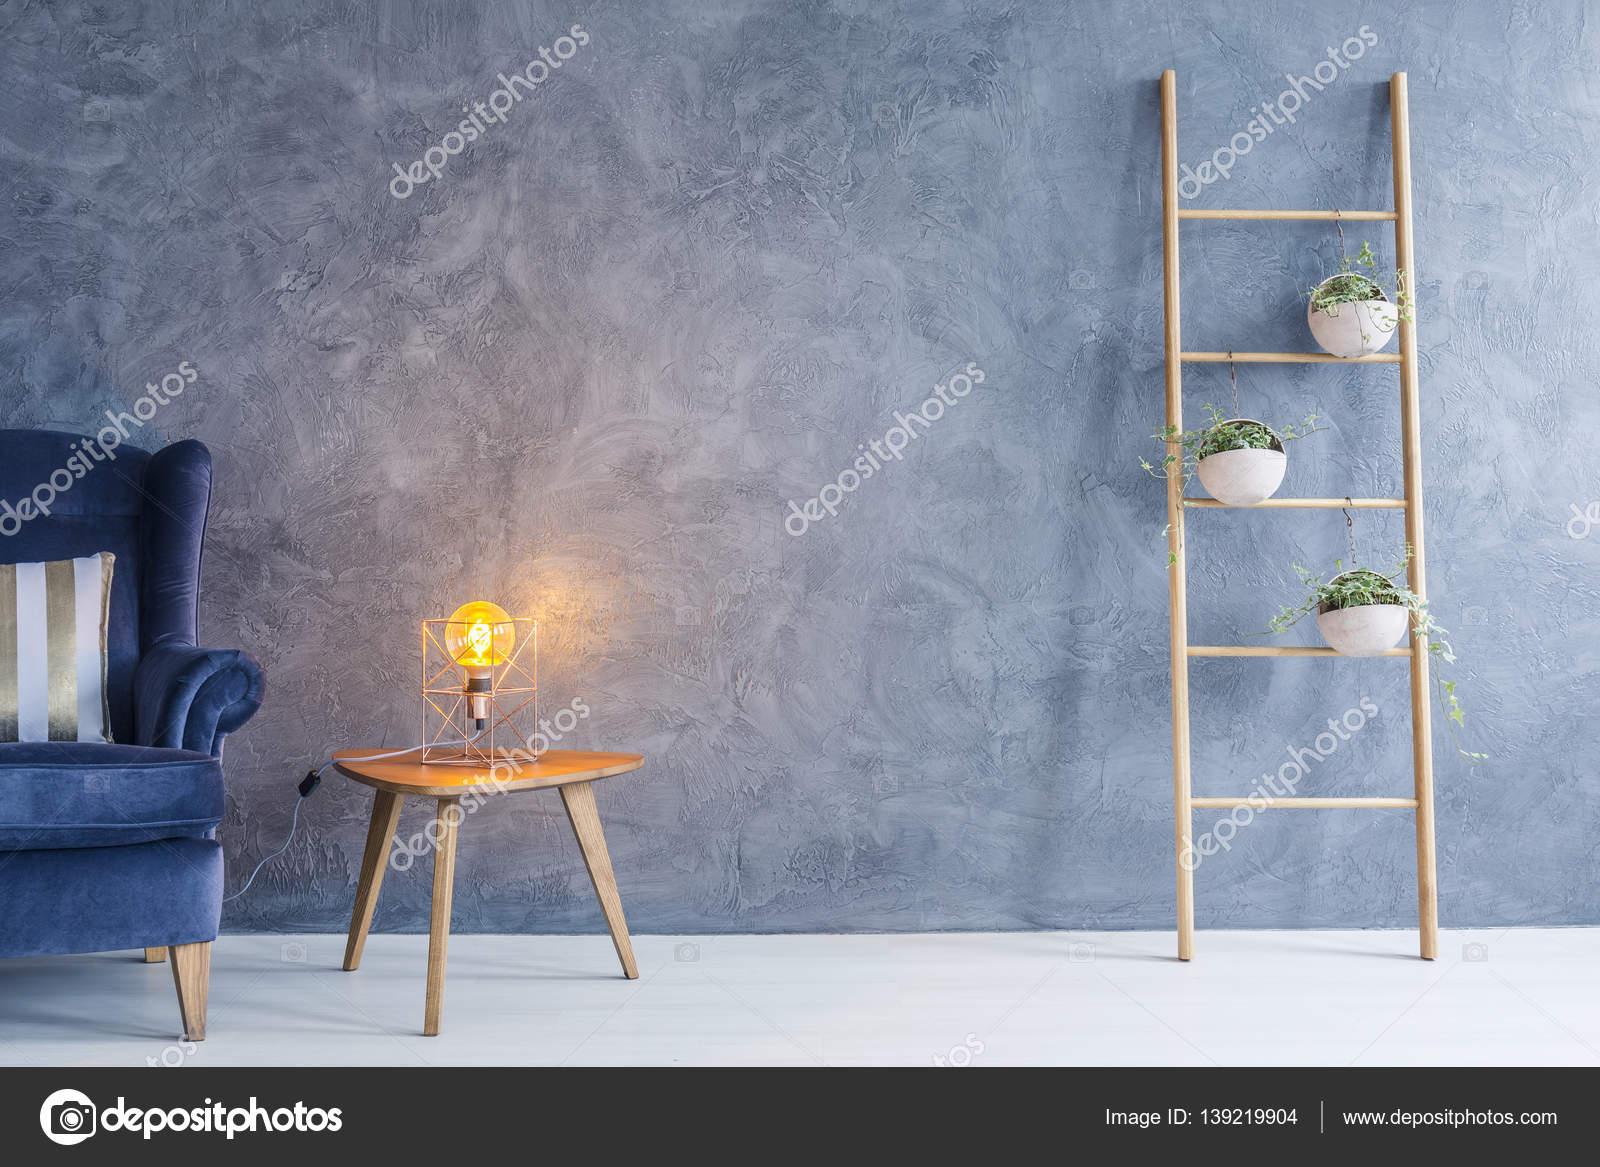 Lampada In Rame Design : Lampada e tavolino di rame u foto stock photographee eu